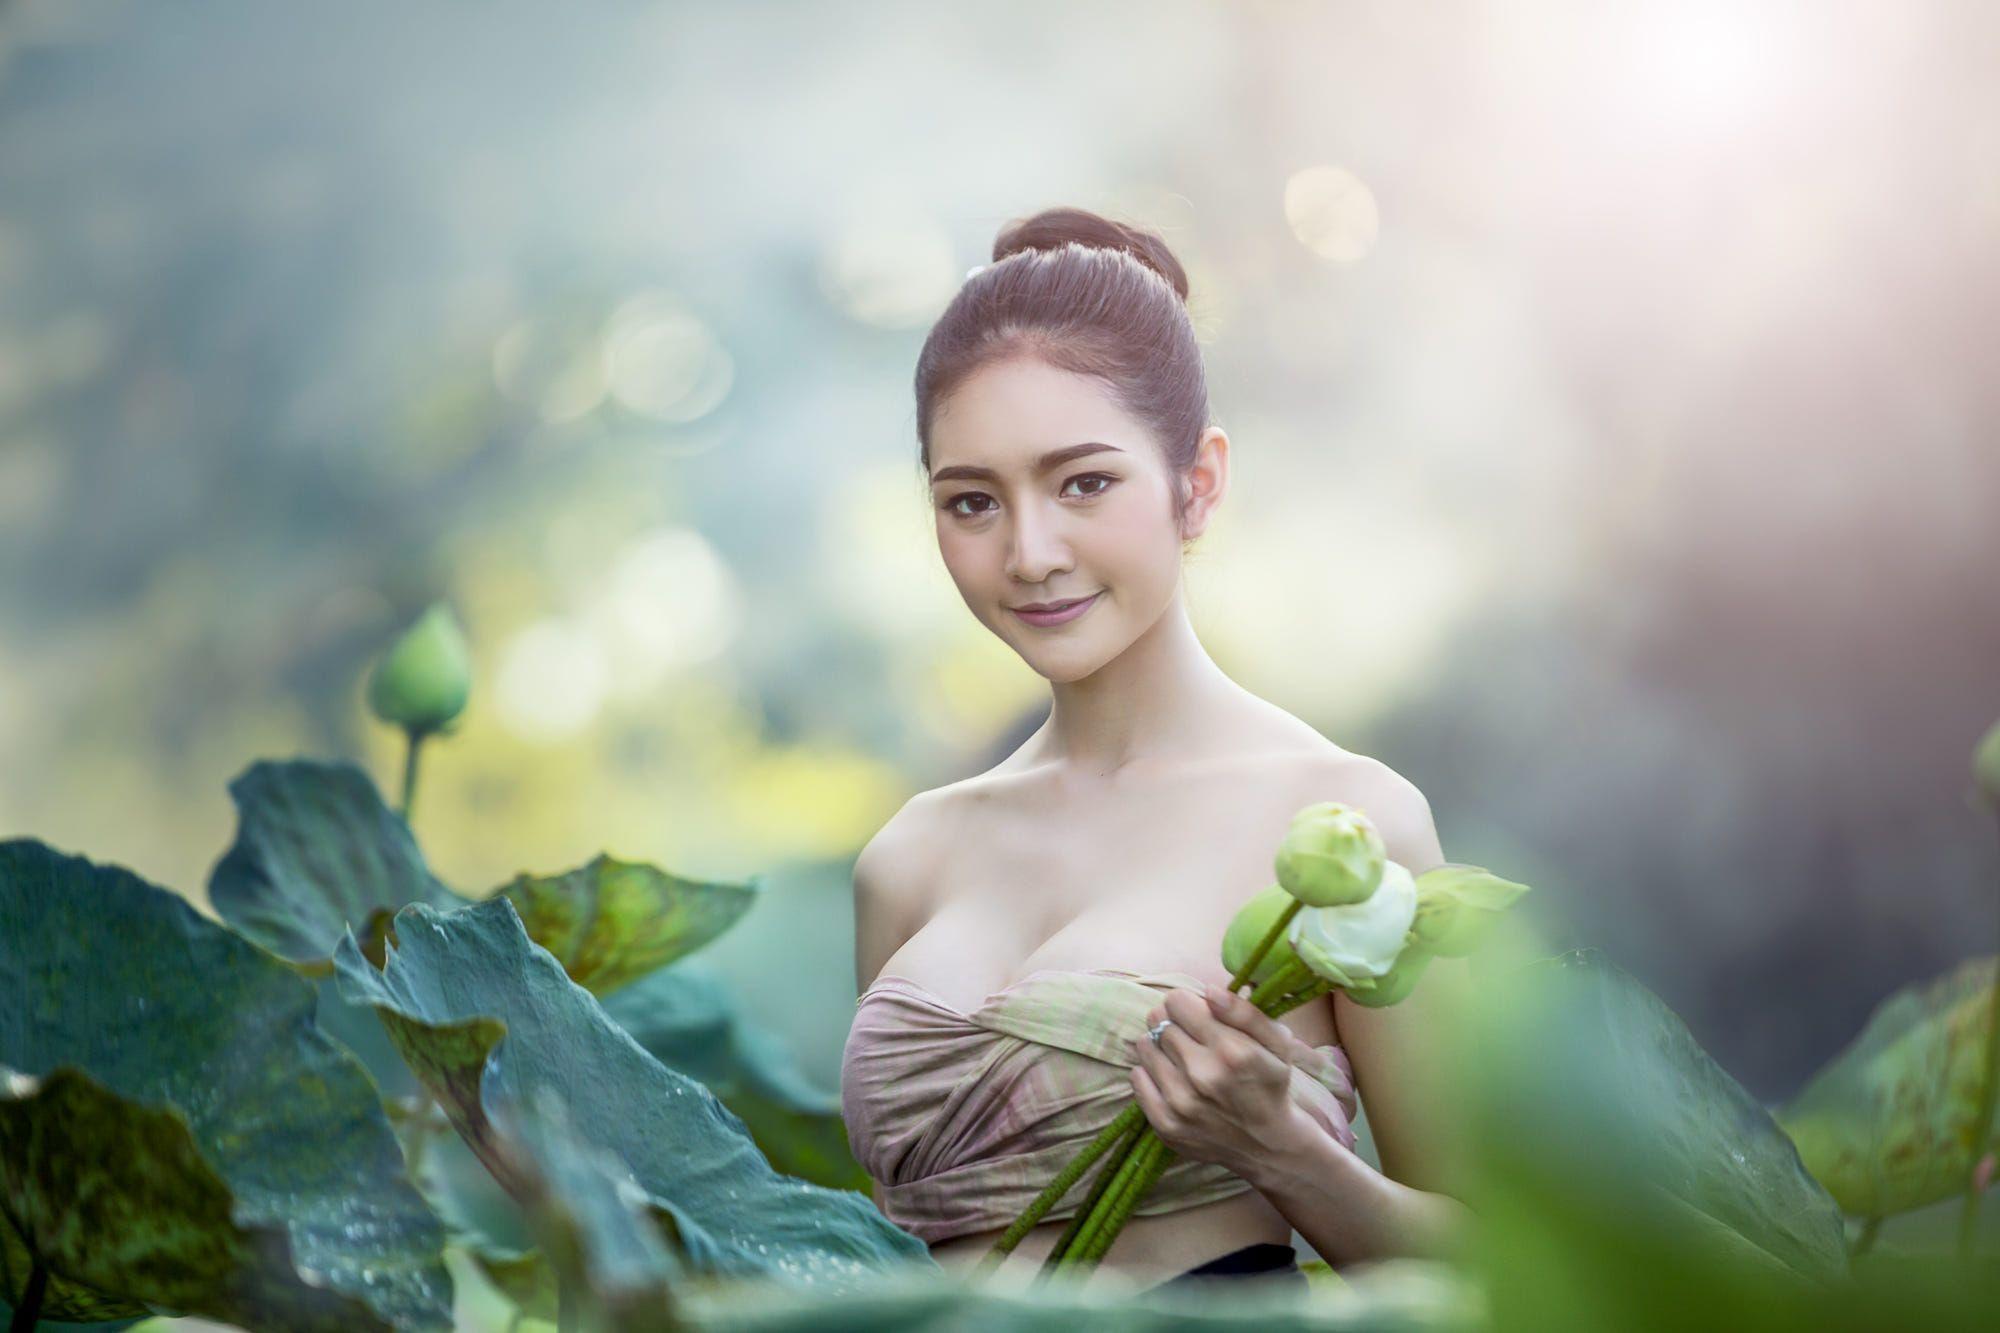 Asian woman harvest lotus flower by Sasin Tipchai on 500px